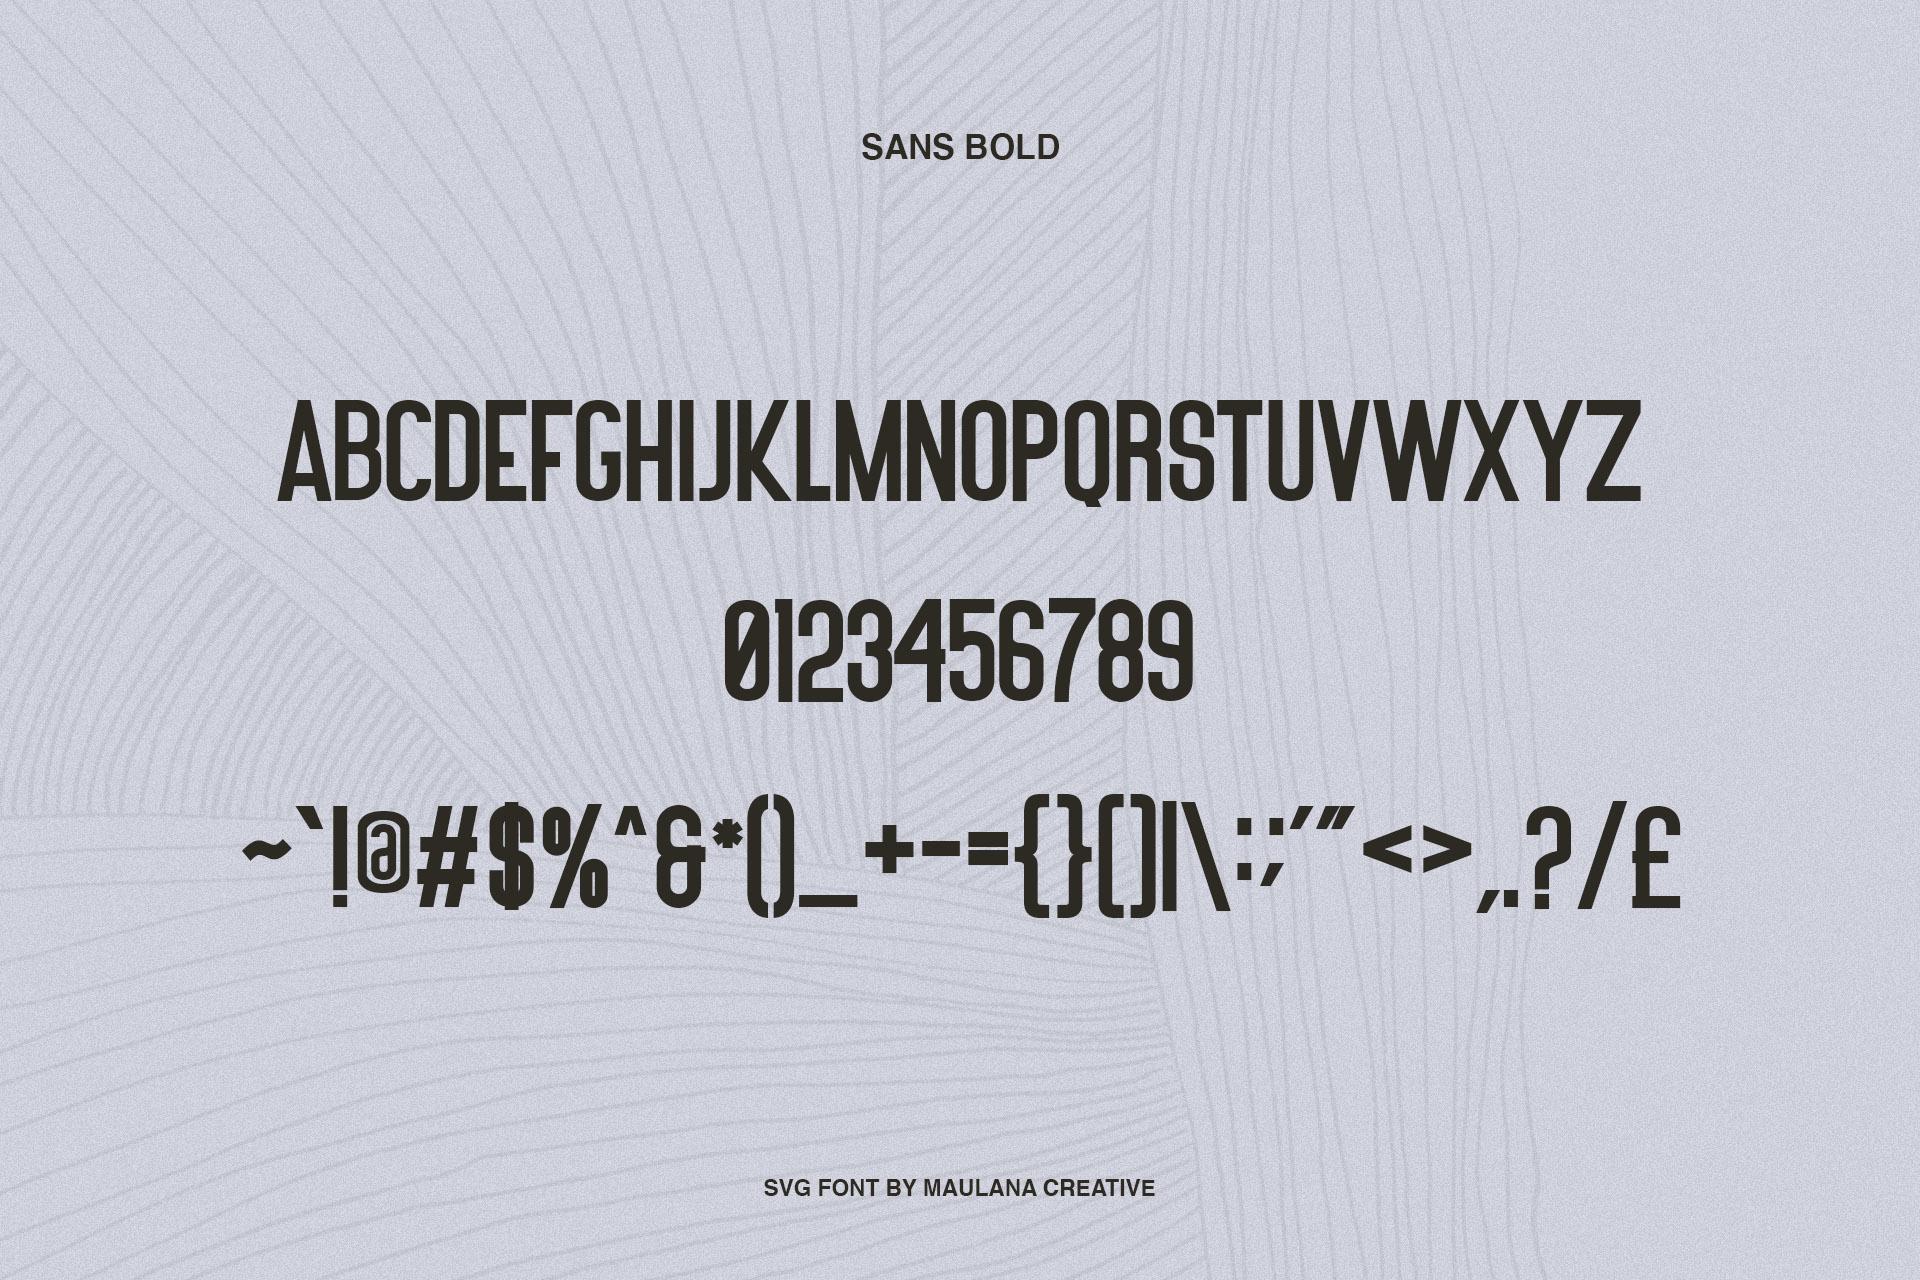 Worthness SVG Brush Font Free Sans example image 10